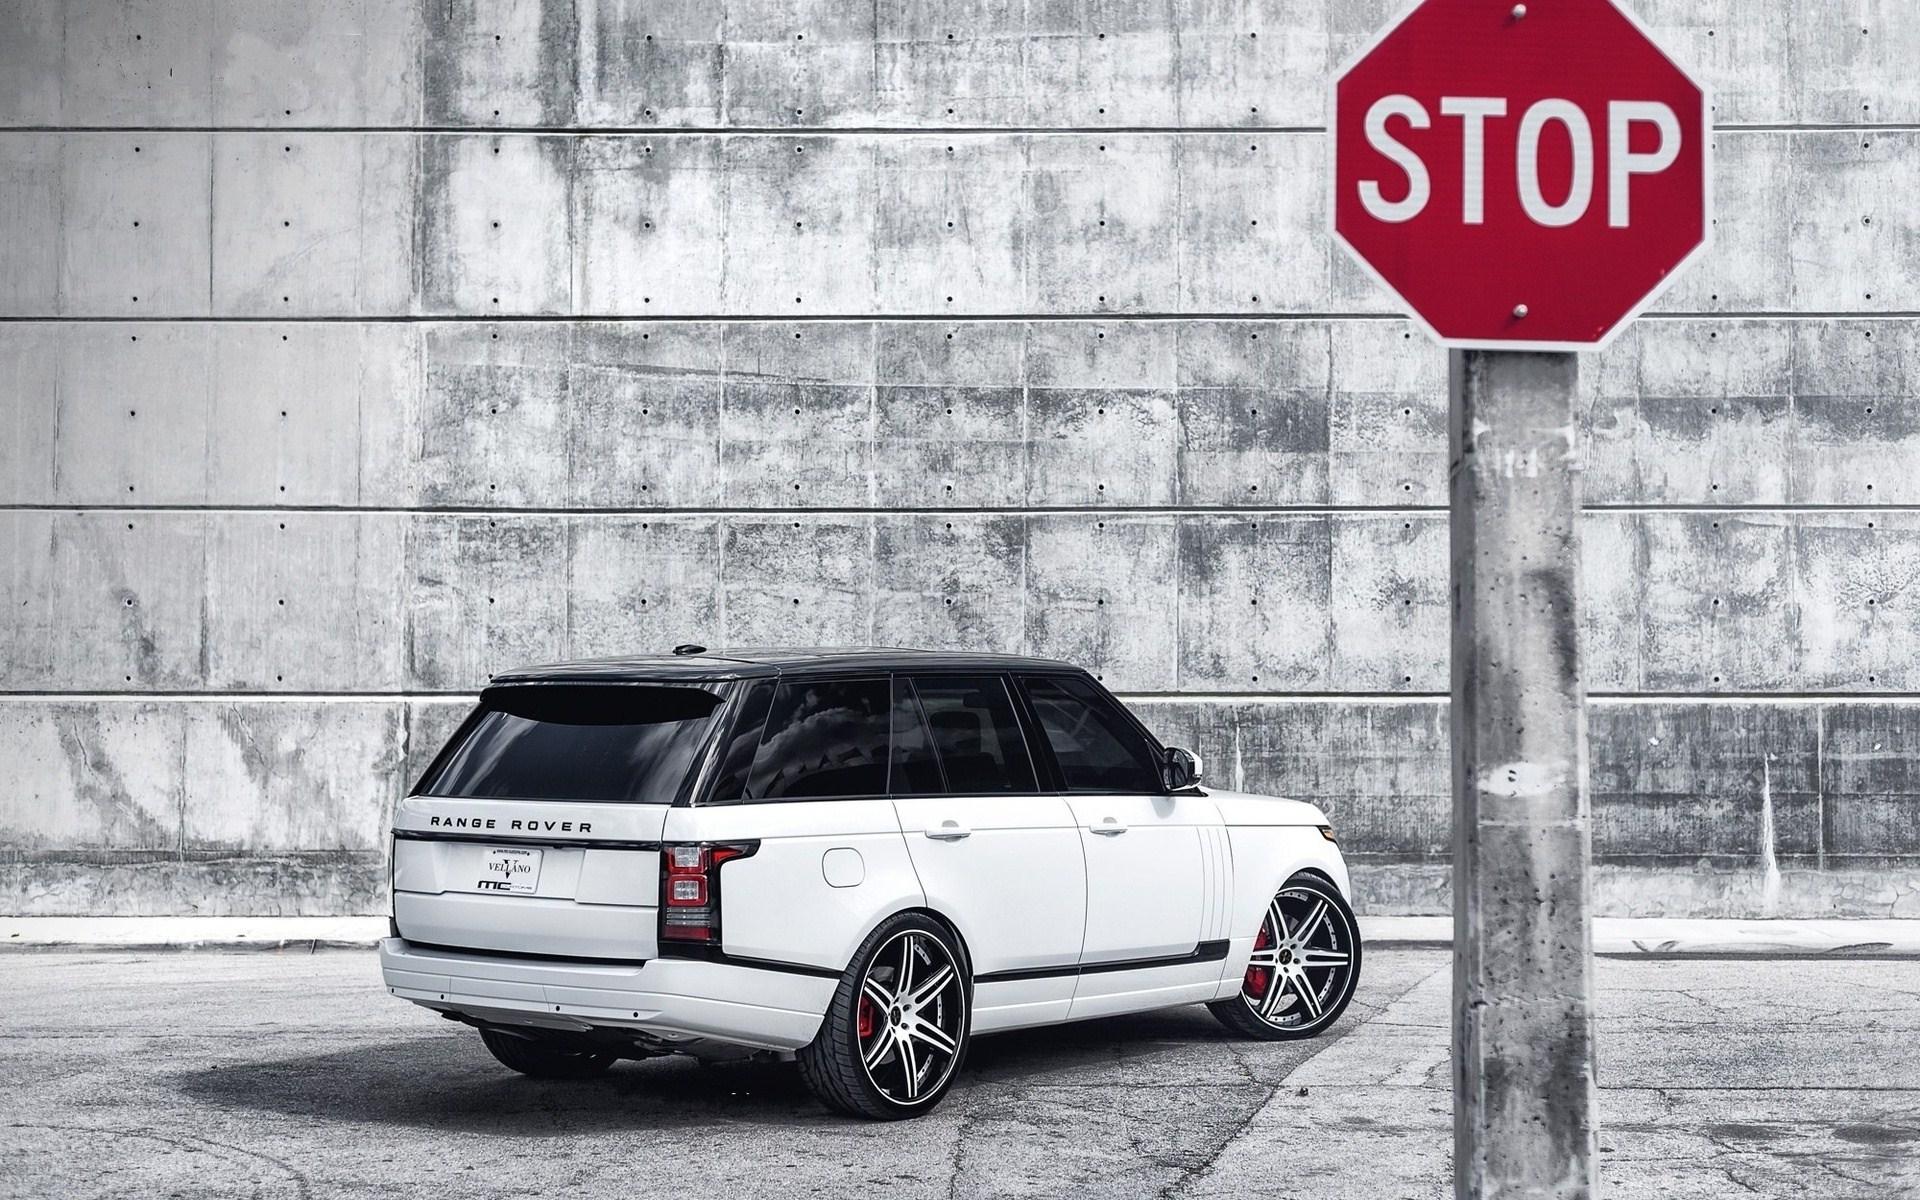 Land Rover Range Rover Stop Sign